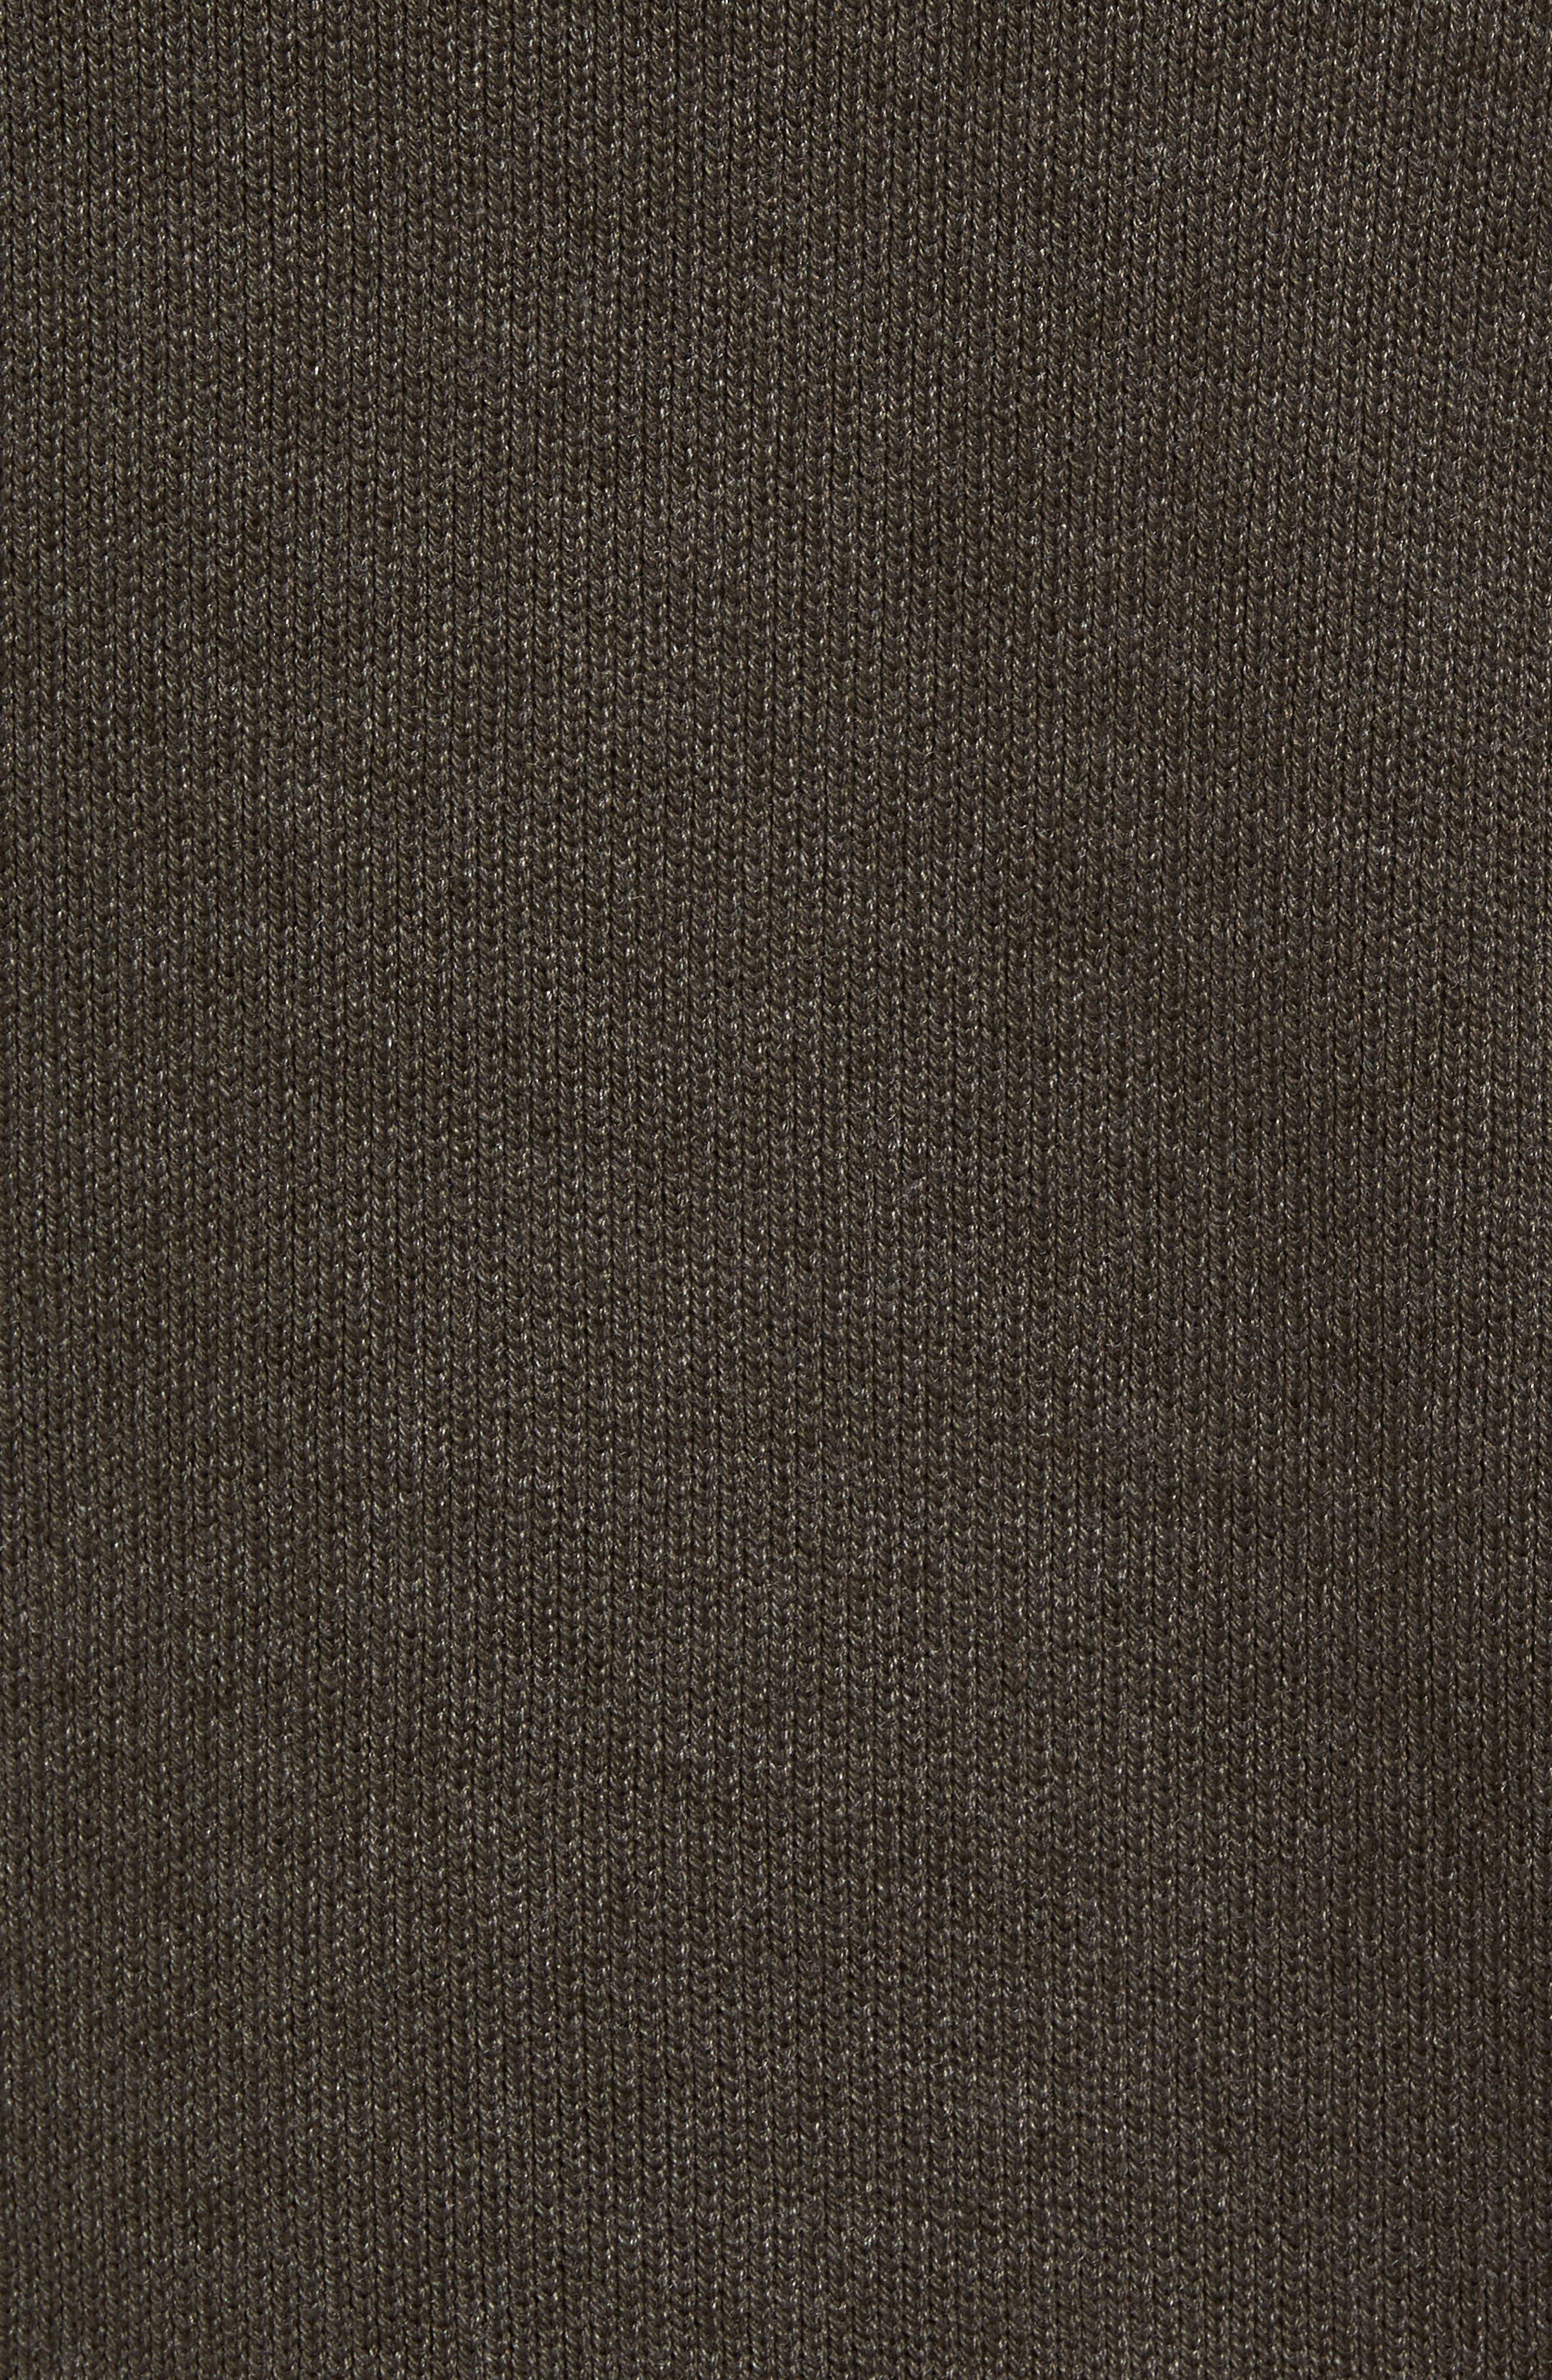 Fleece Lined Zip Hoodie,                             Alternate thumbnail 5, color,                             391